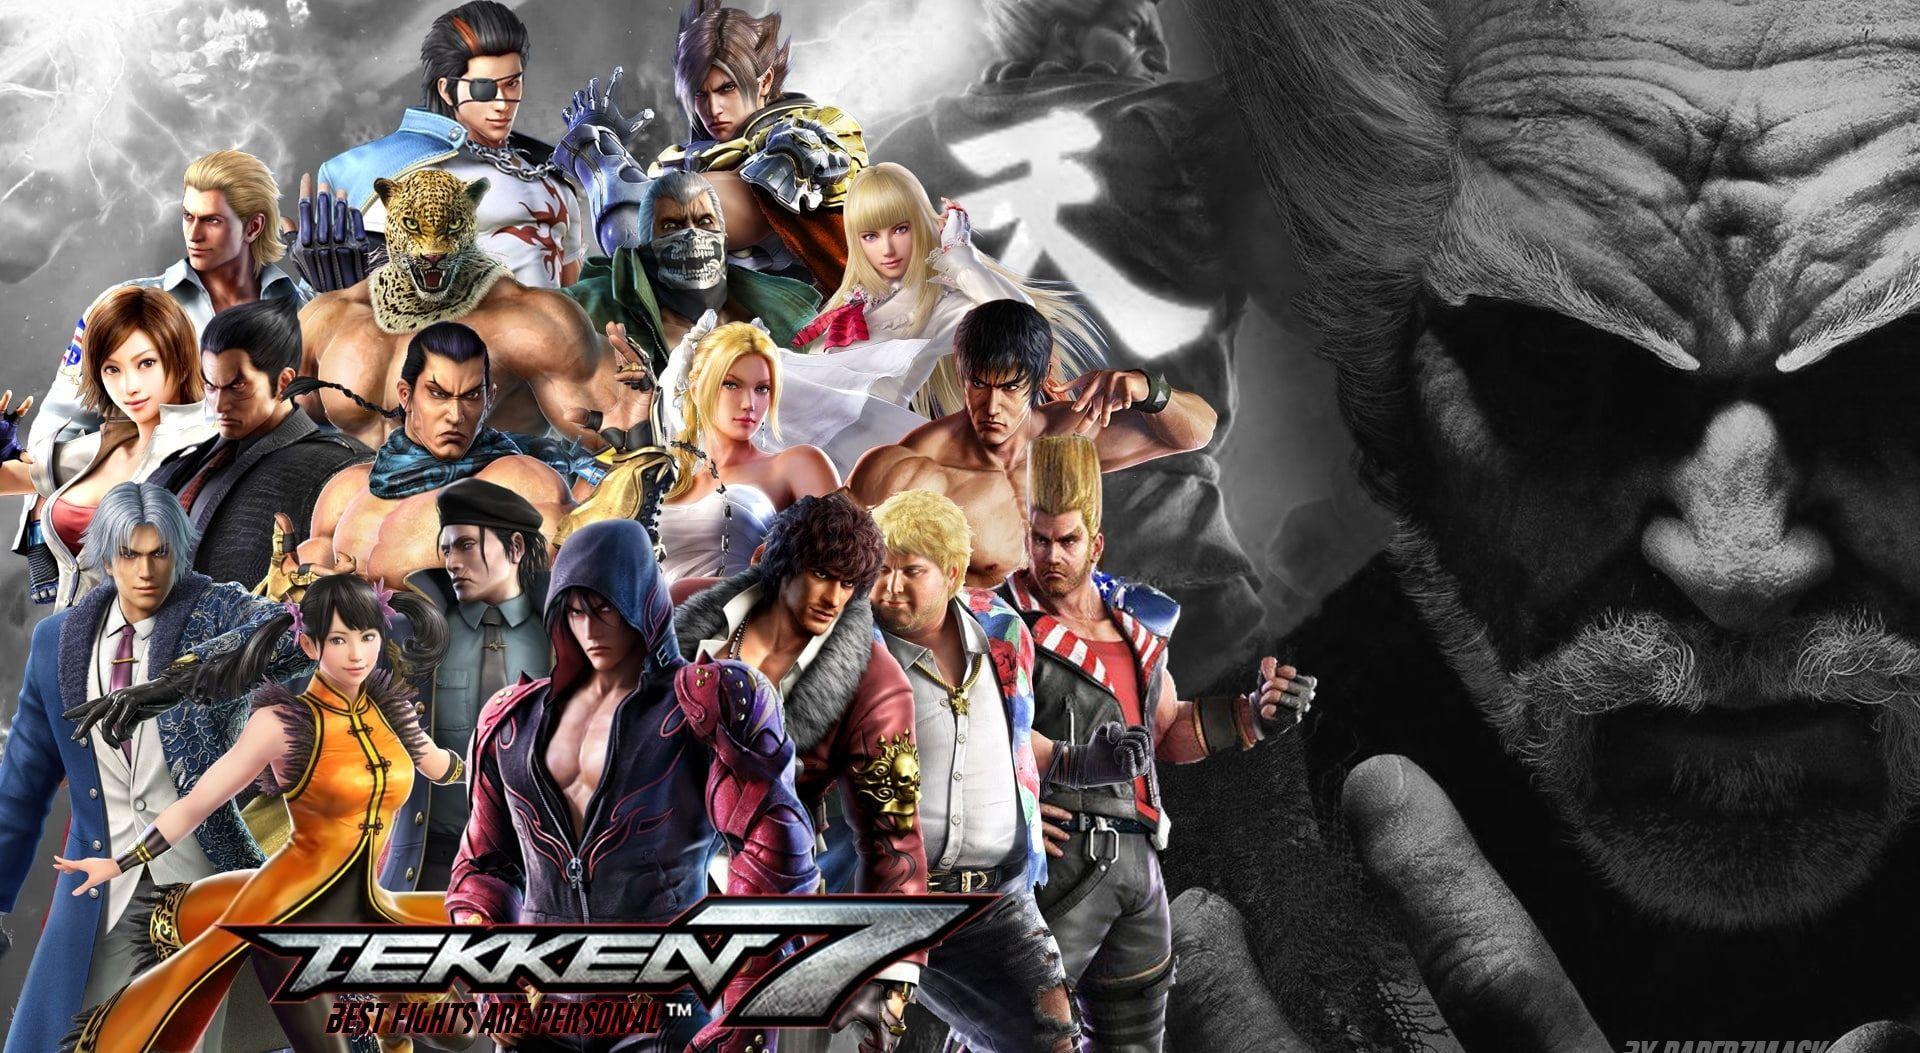 Tekken 7 Games Other Games Game Tekken Jin Kazama Tekken 7 1080p Wallpaper Hdwallpaper Desktop Tekken 7 Jin Kazama Hd Wallpaper